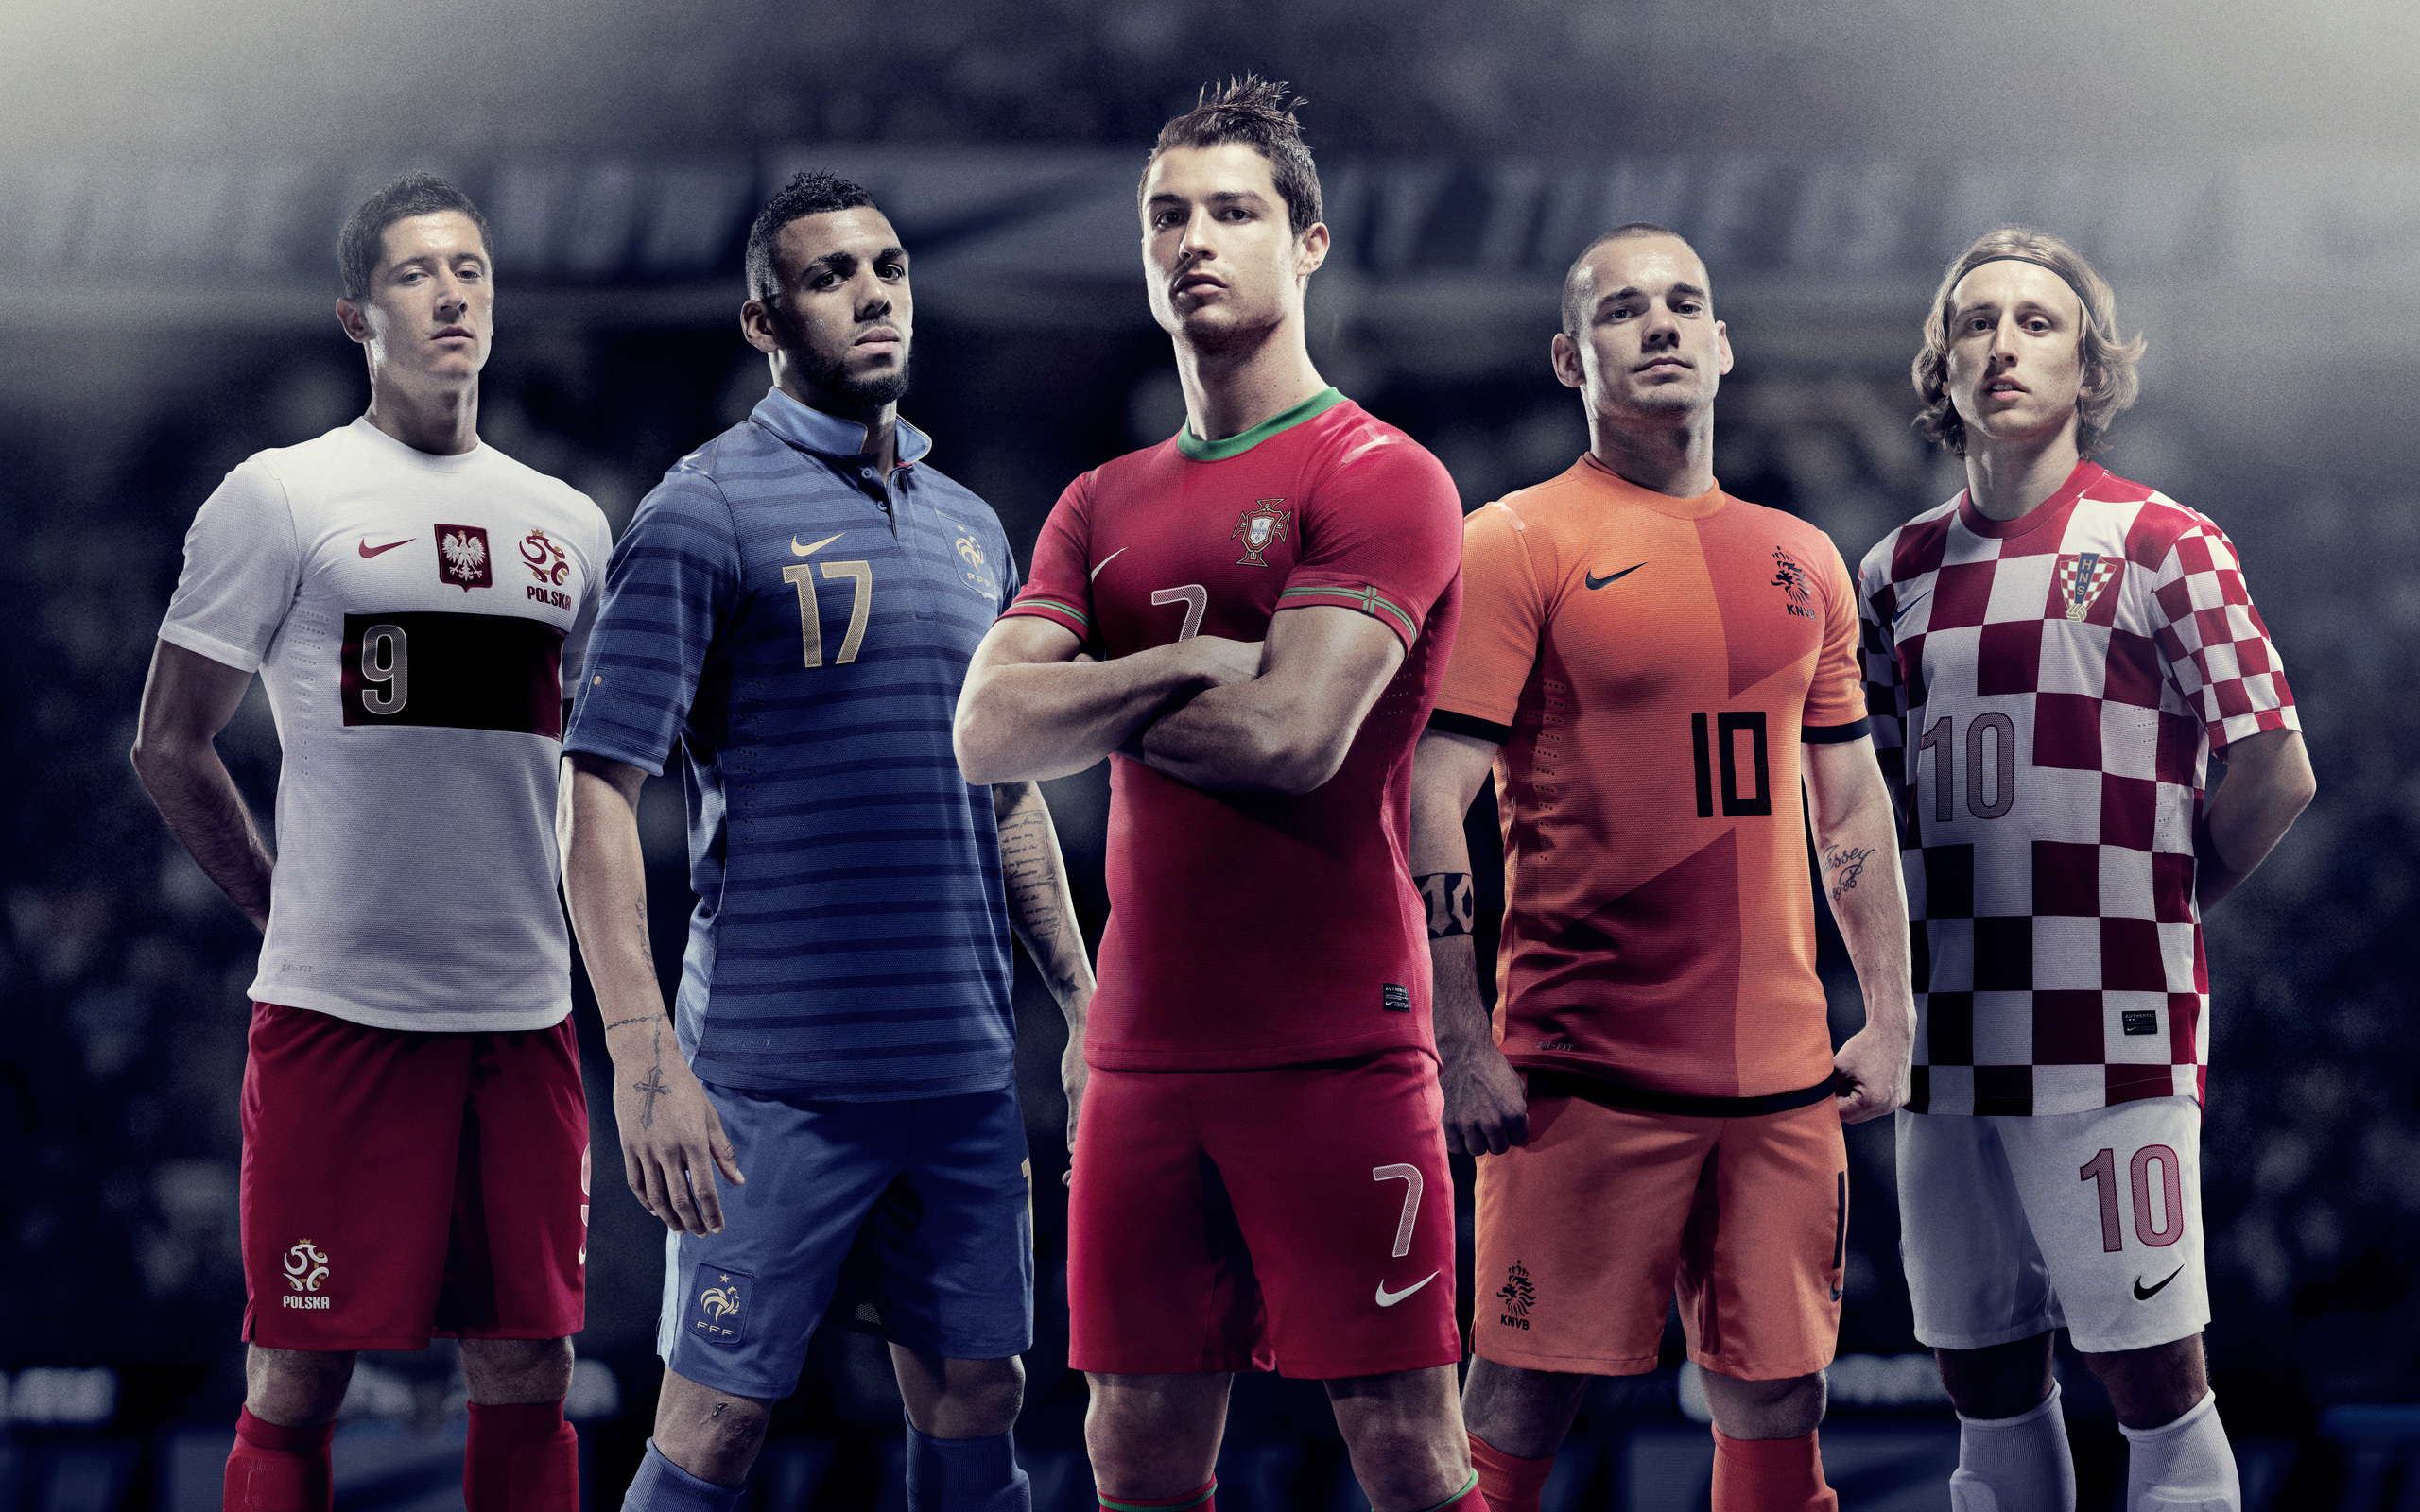 2560x1600 Cristiano Ronaldo Nike Players 5k 2560x1600 Resolution Hd